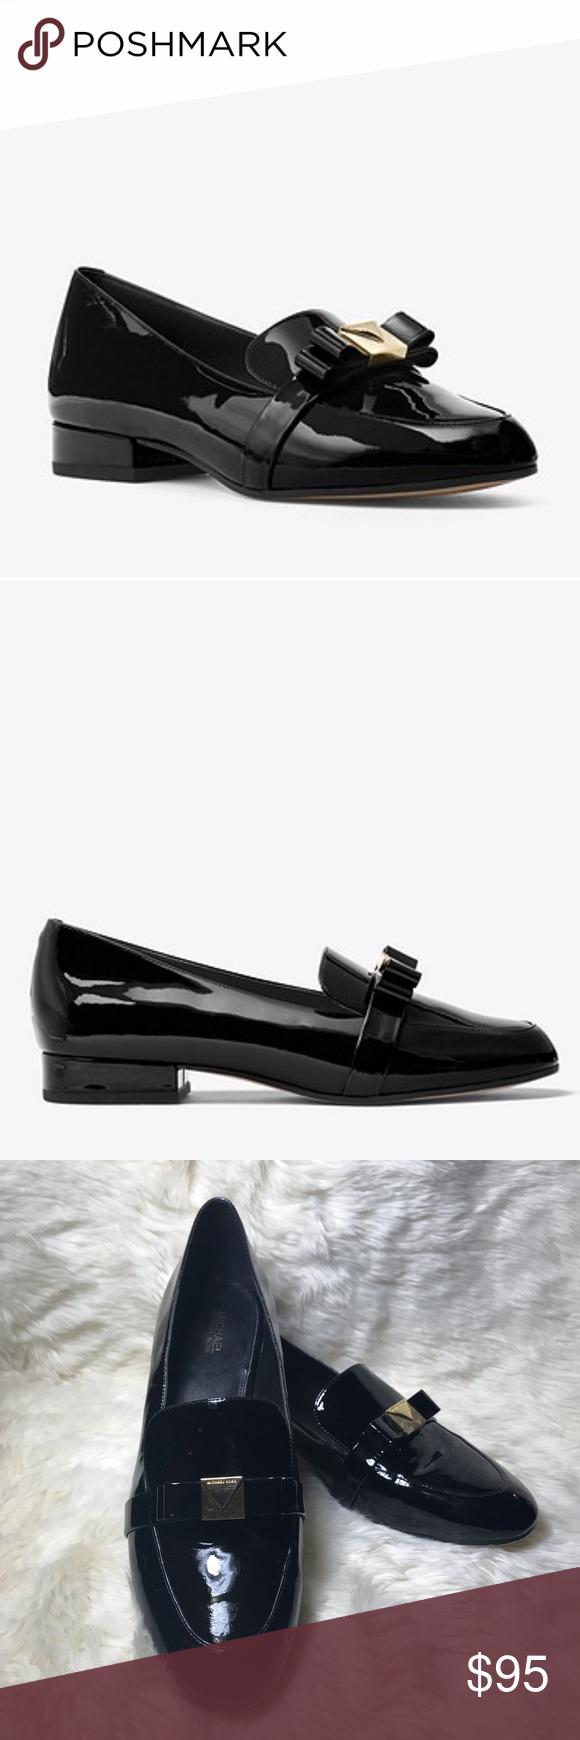 Michael Kors Caroline Patent Leather